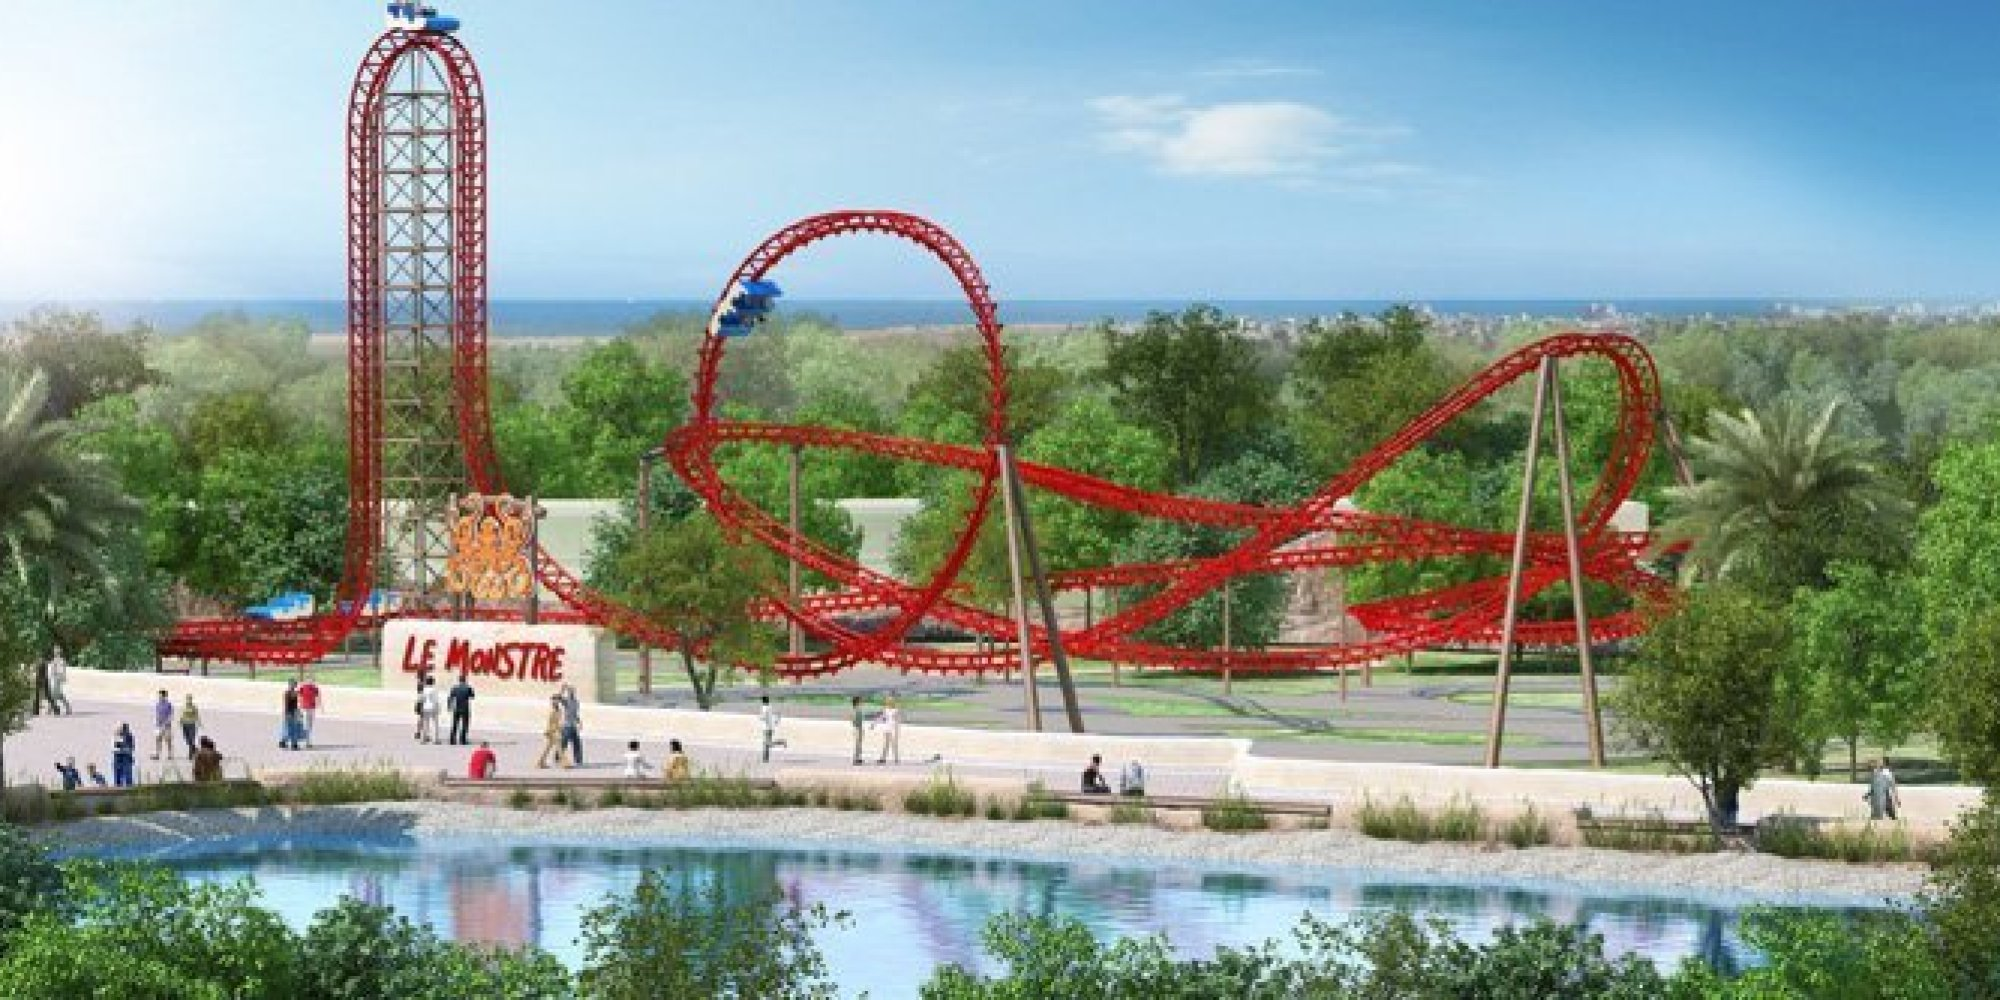 Le parc Sindibad ouvrira ses portes mercredi 12 août Alec Baldwin Facebook